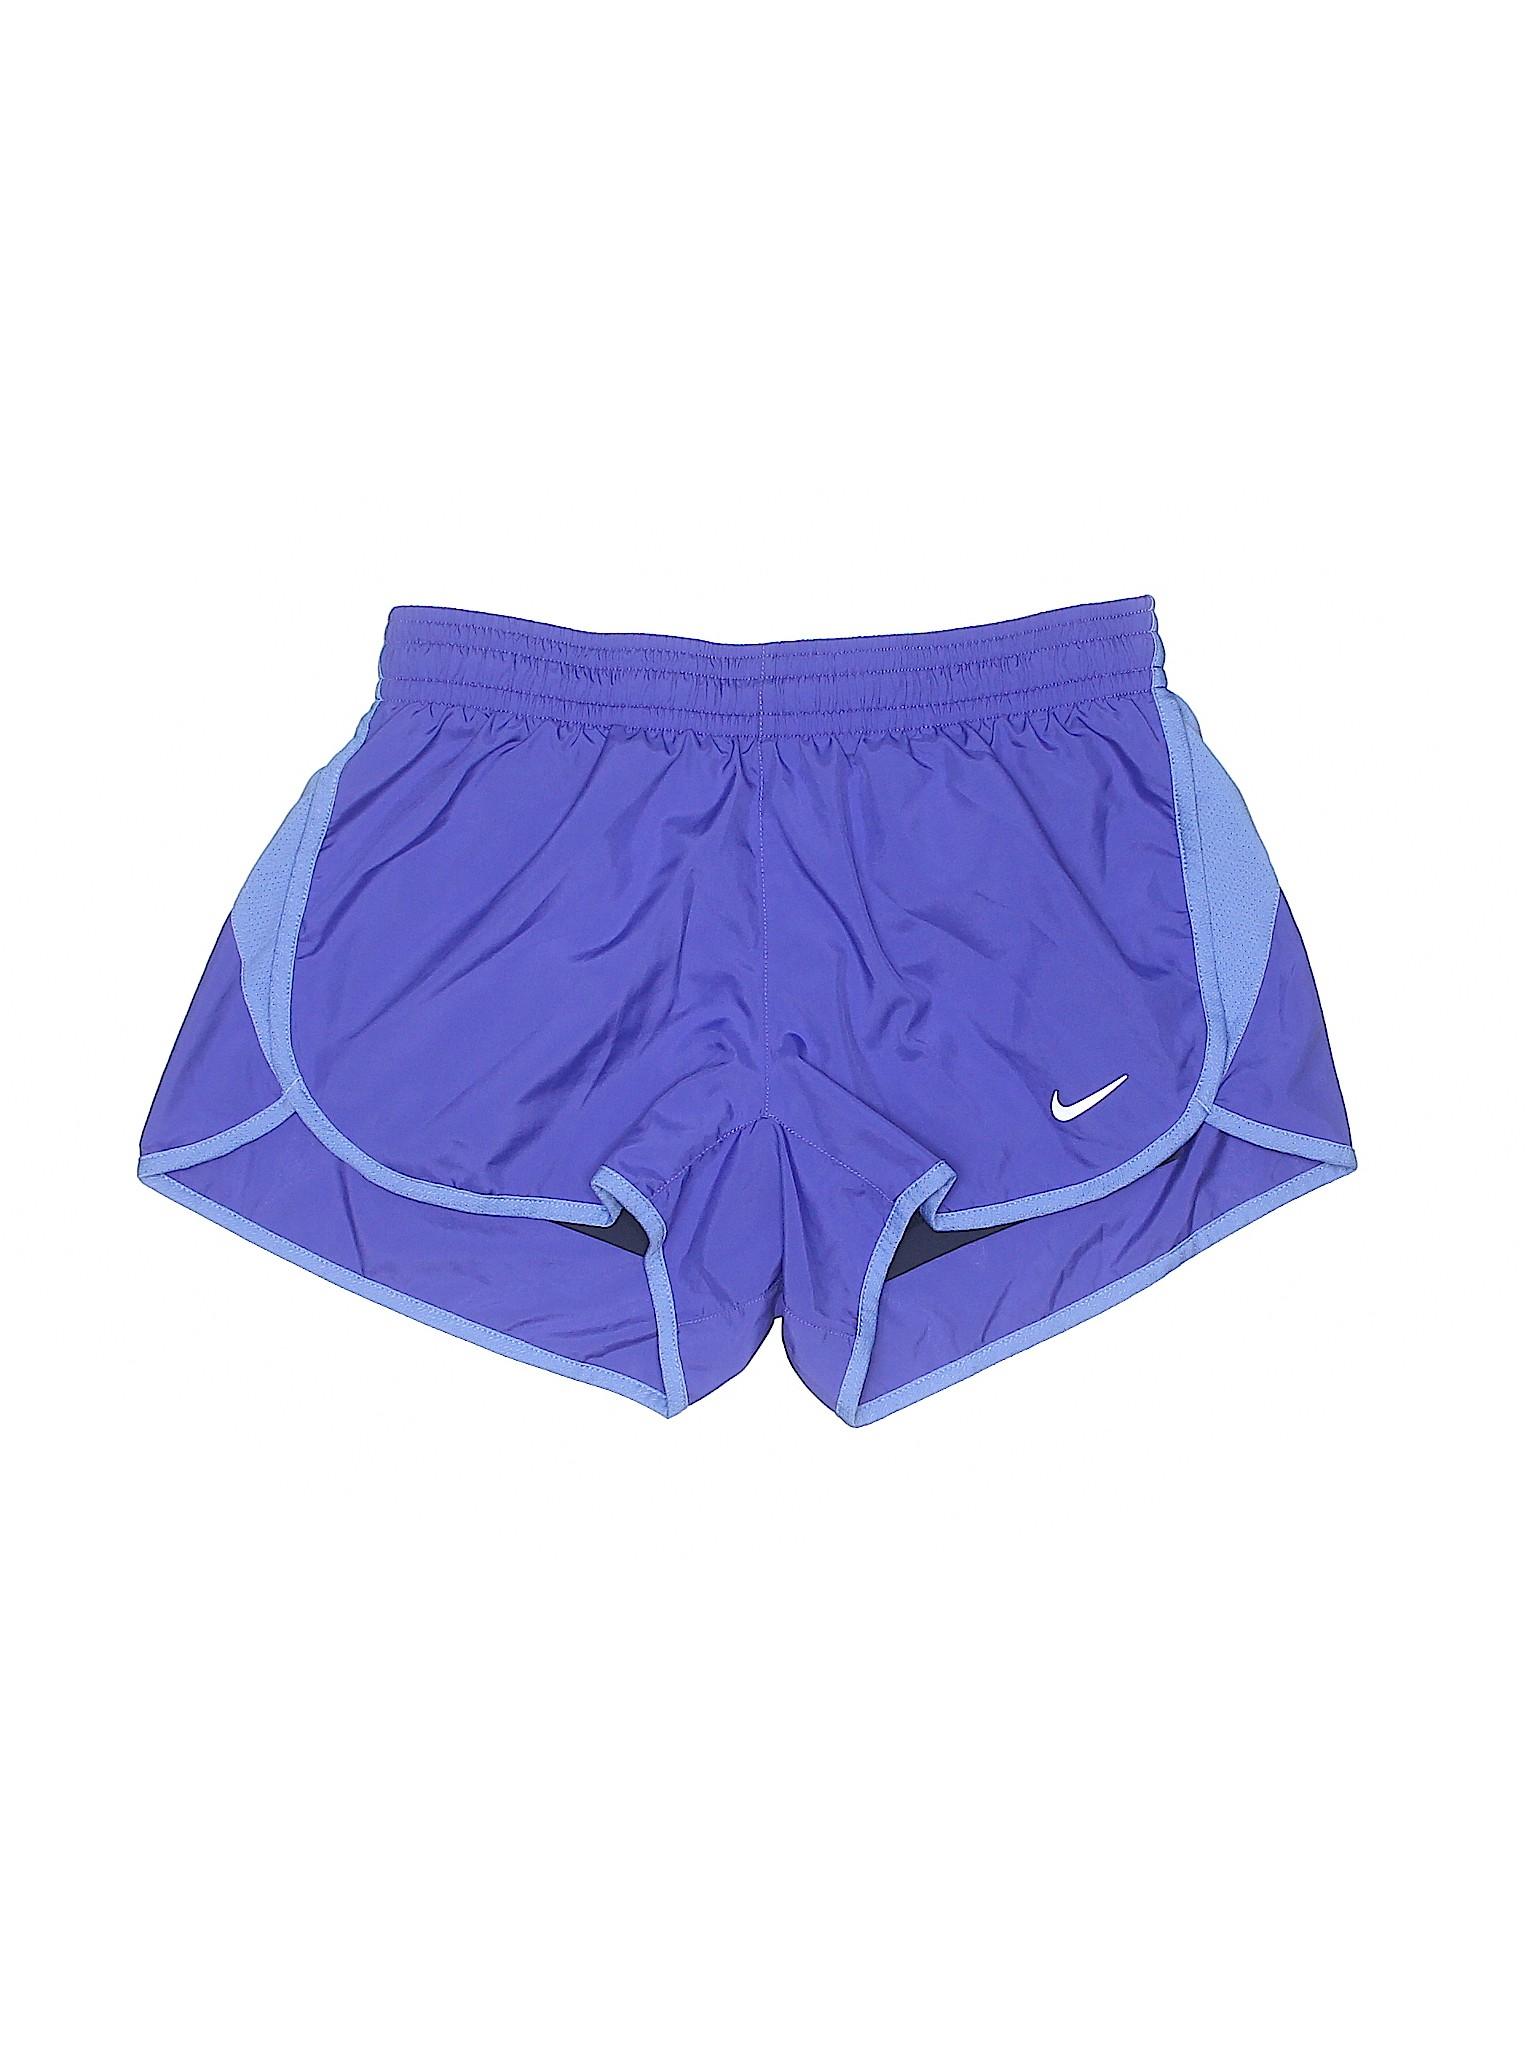 Boutique Nike Shorts Boutique Nike Athletic gpnqUOp